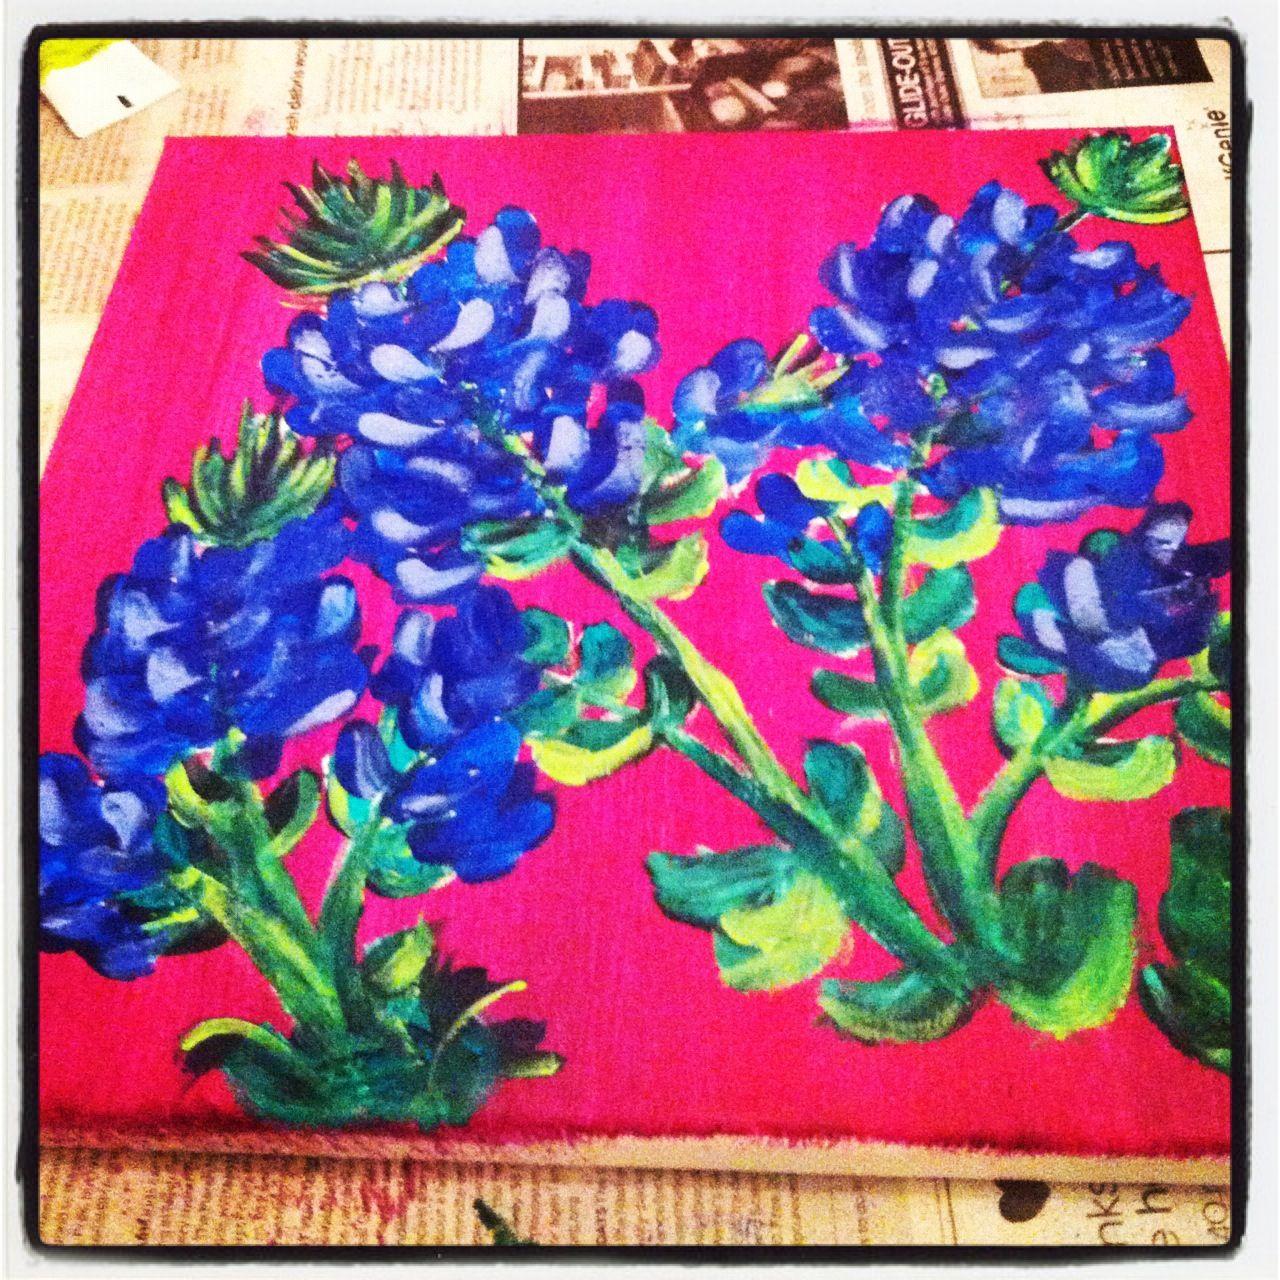 Western Decor Paint: Texas Bluebonnet Painting DIY